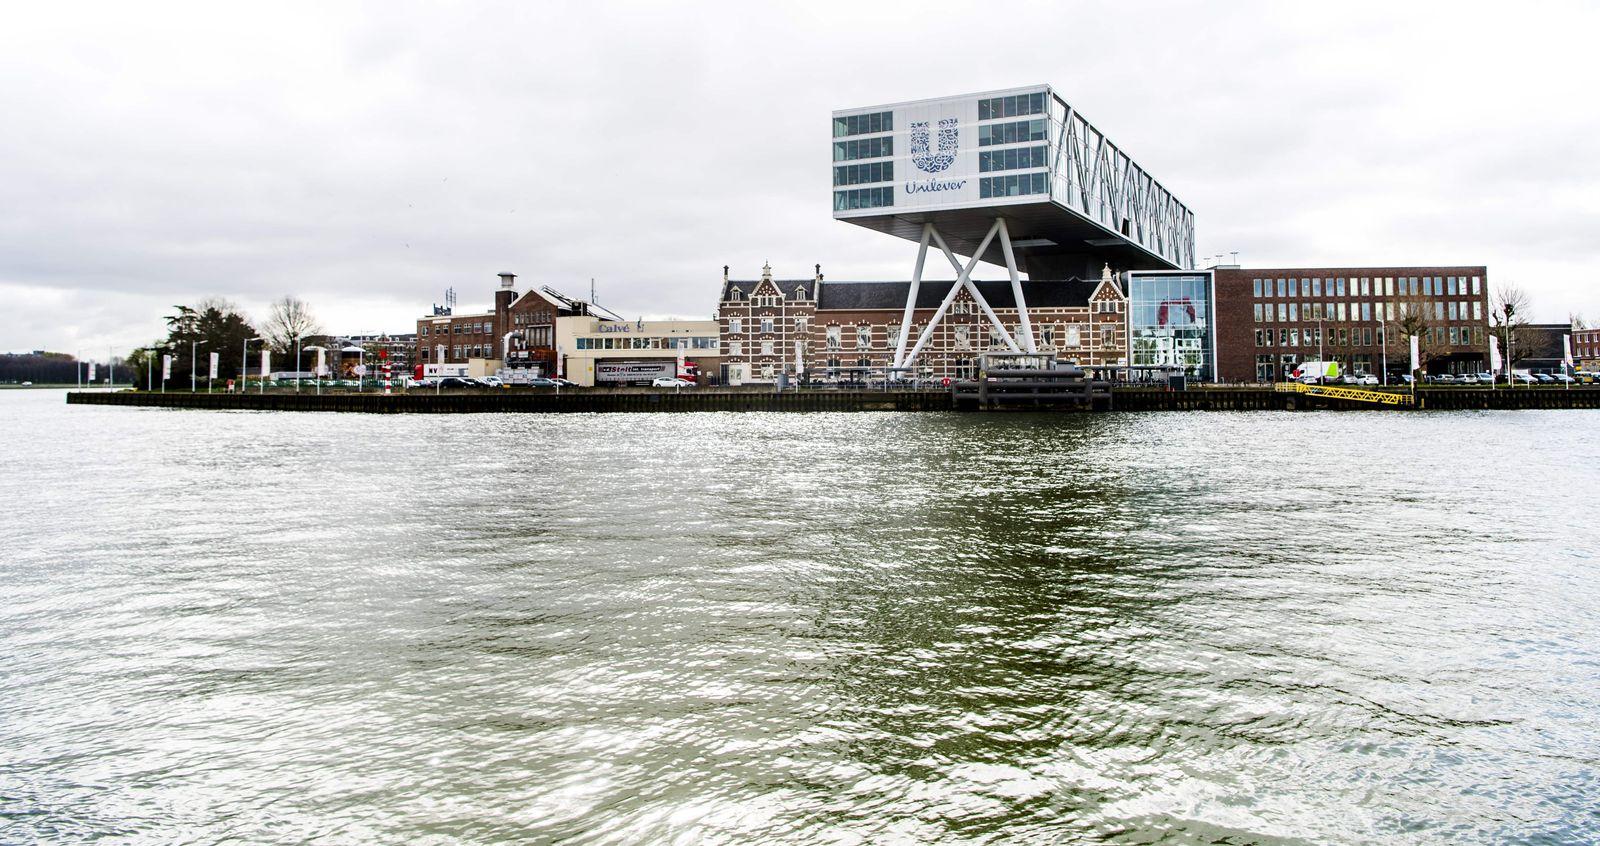 NETHERLANDS-BRITAIN-UNILEVER-FOOD-SALE-MARGARINE